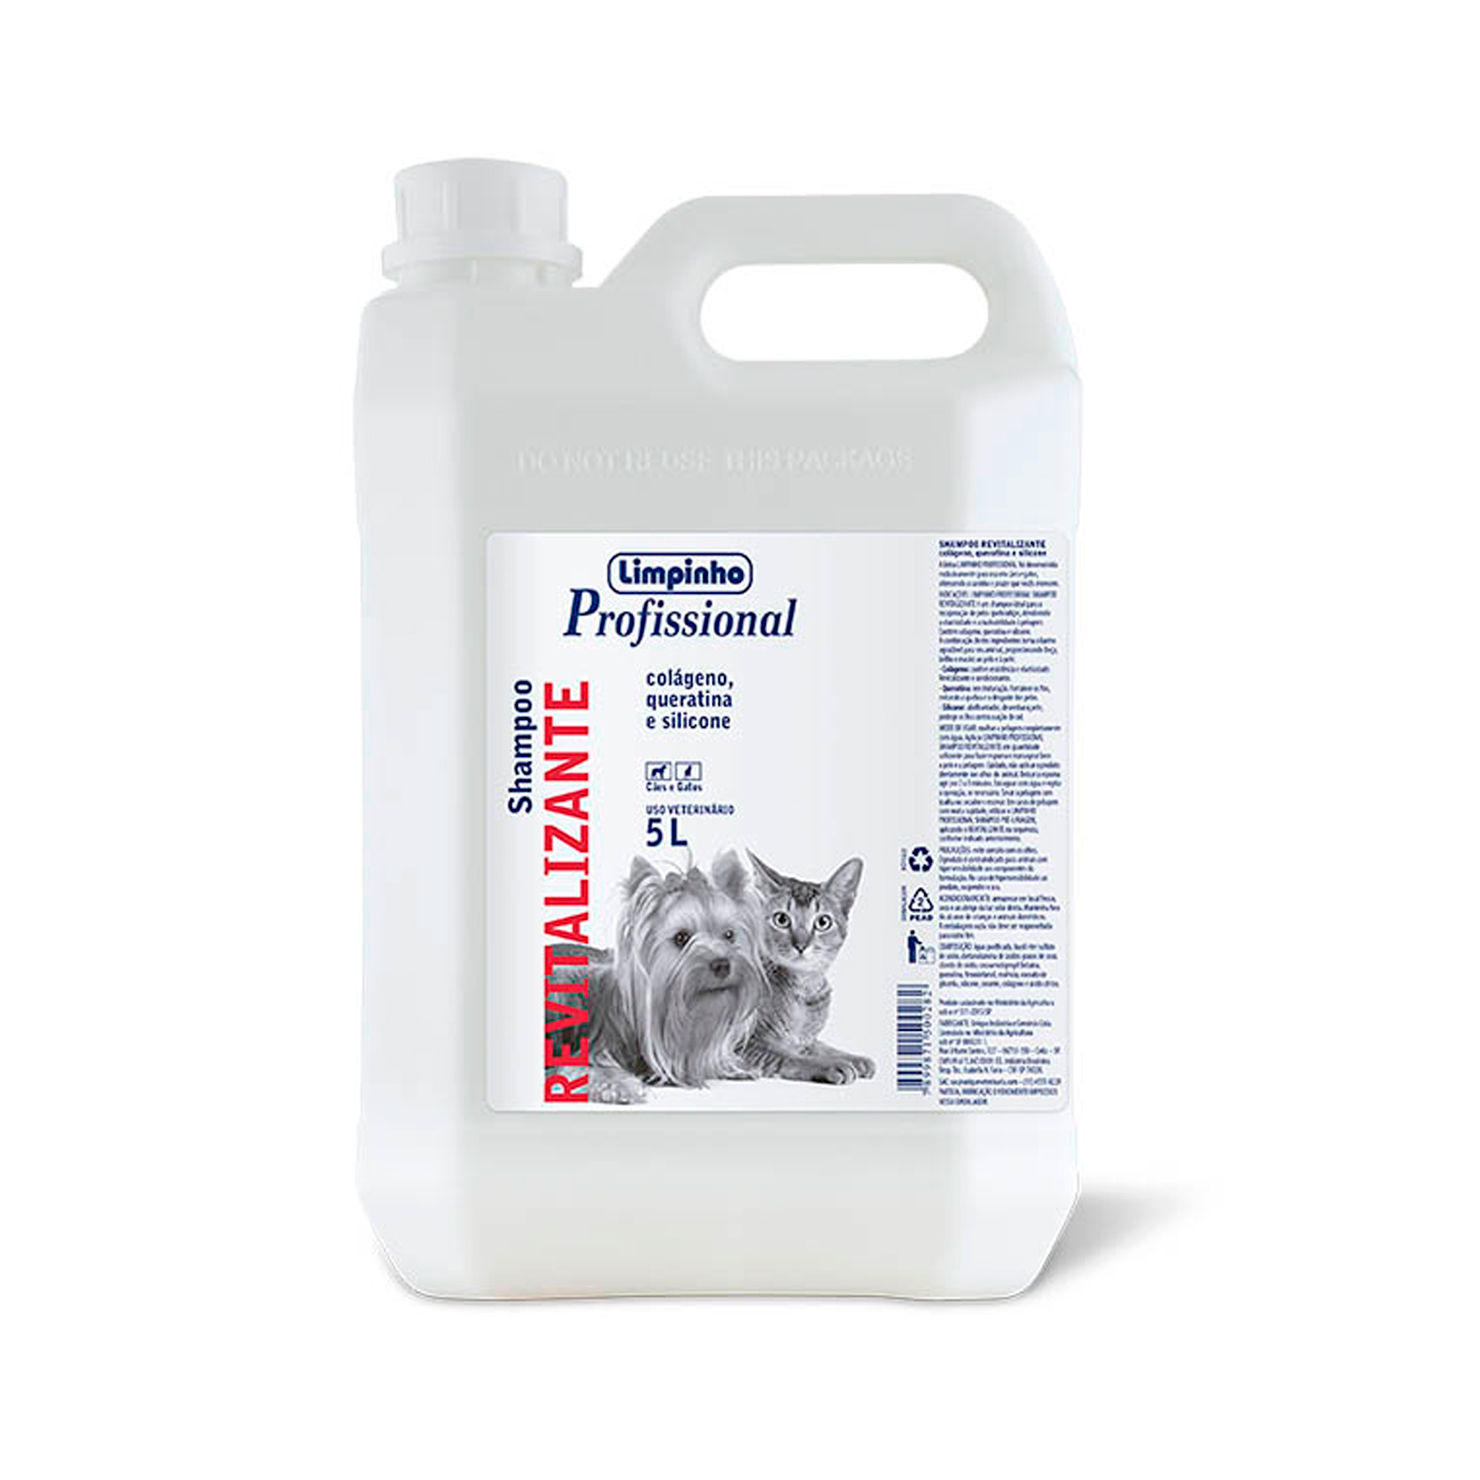 Shampoo Profissional Revitalizante Limpinho 5L